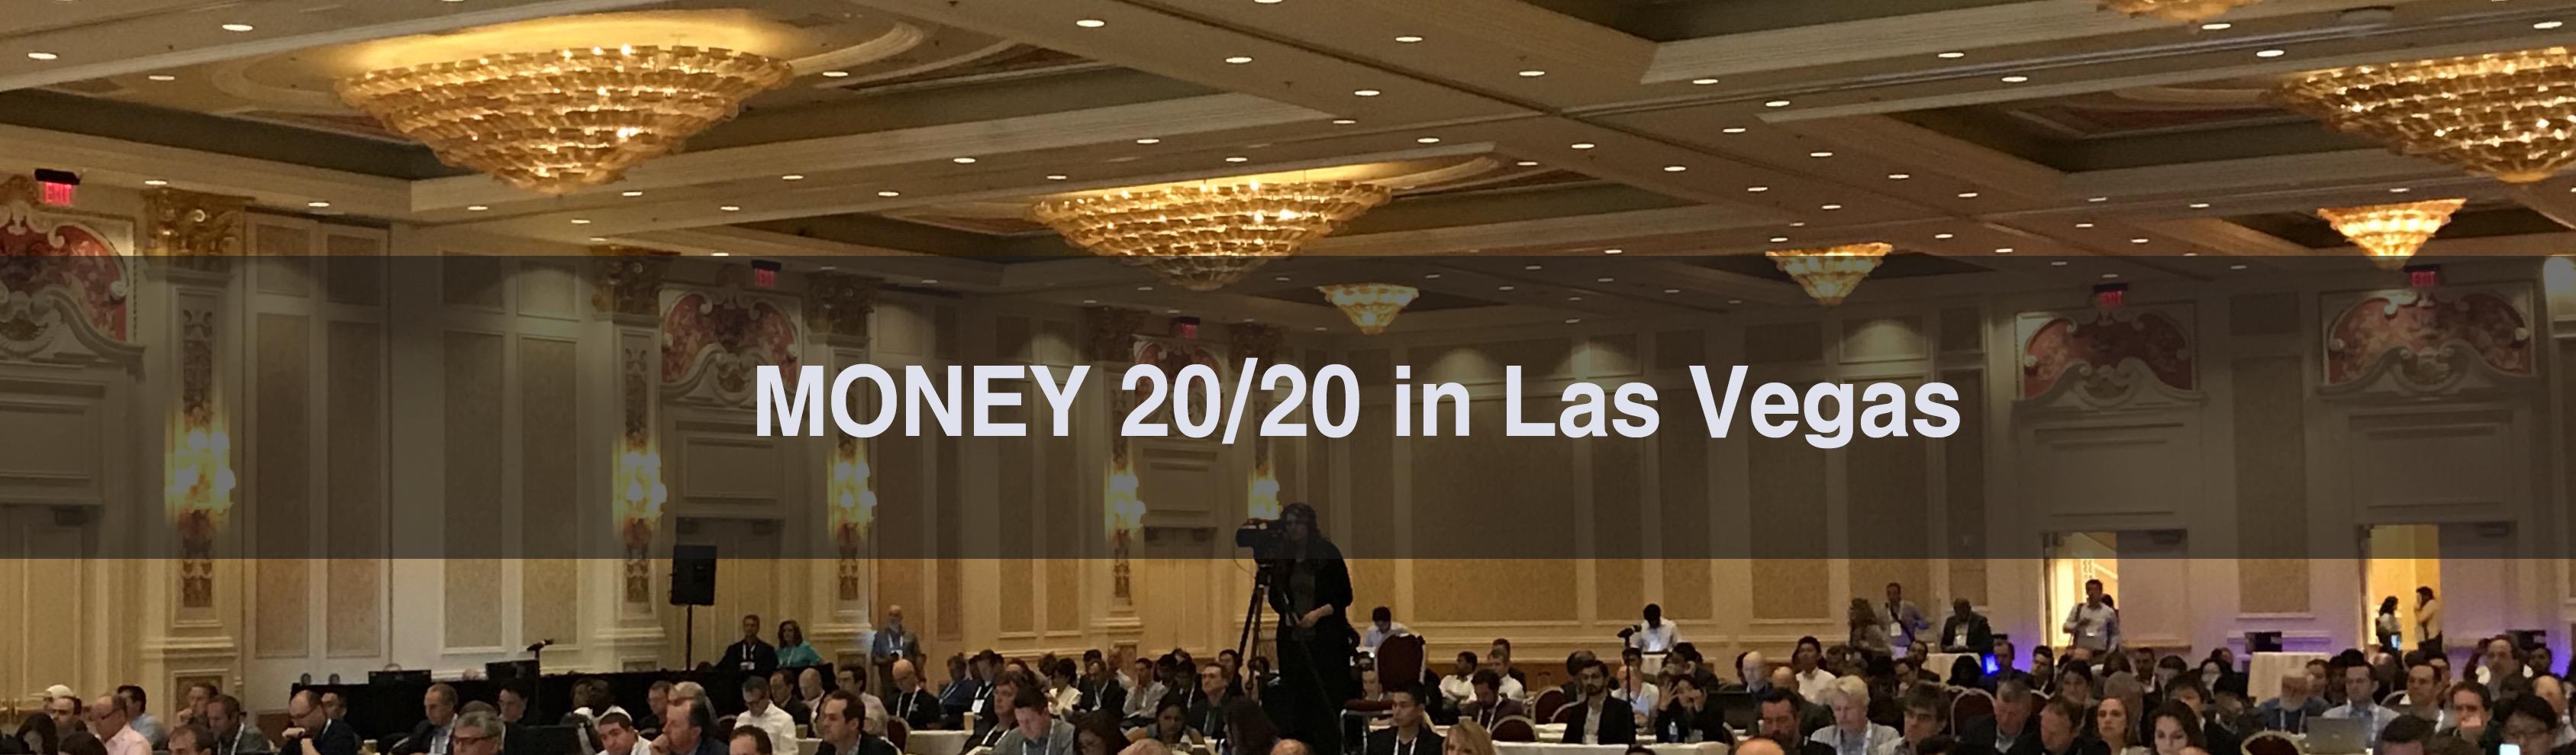 Money 20/20 in Las Vegas